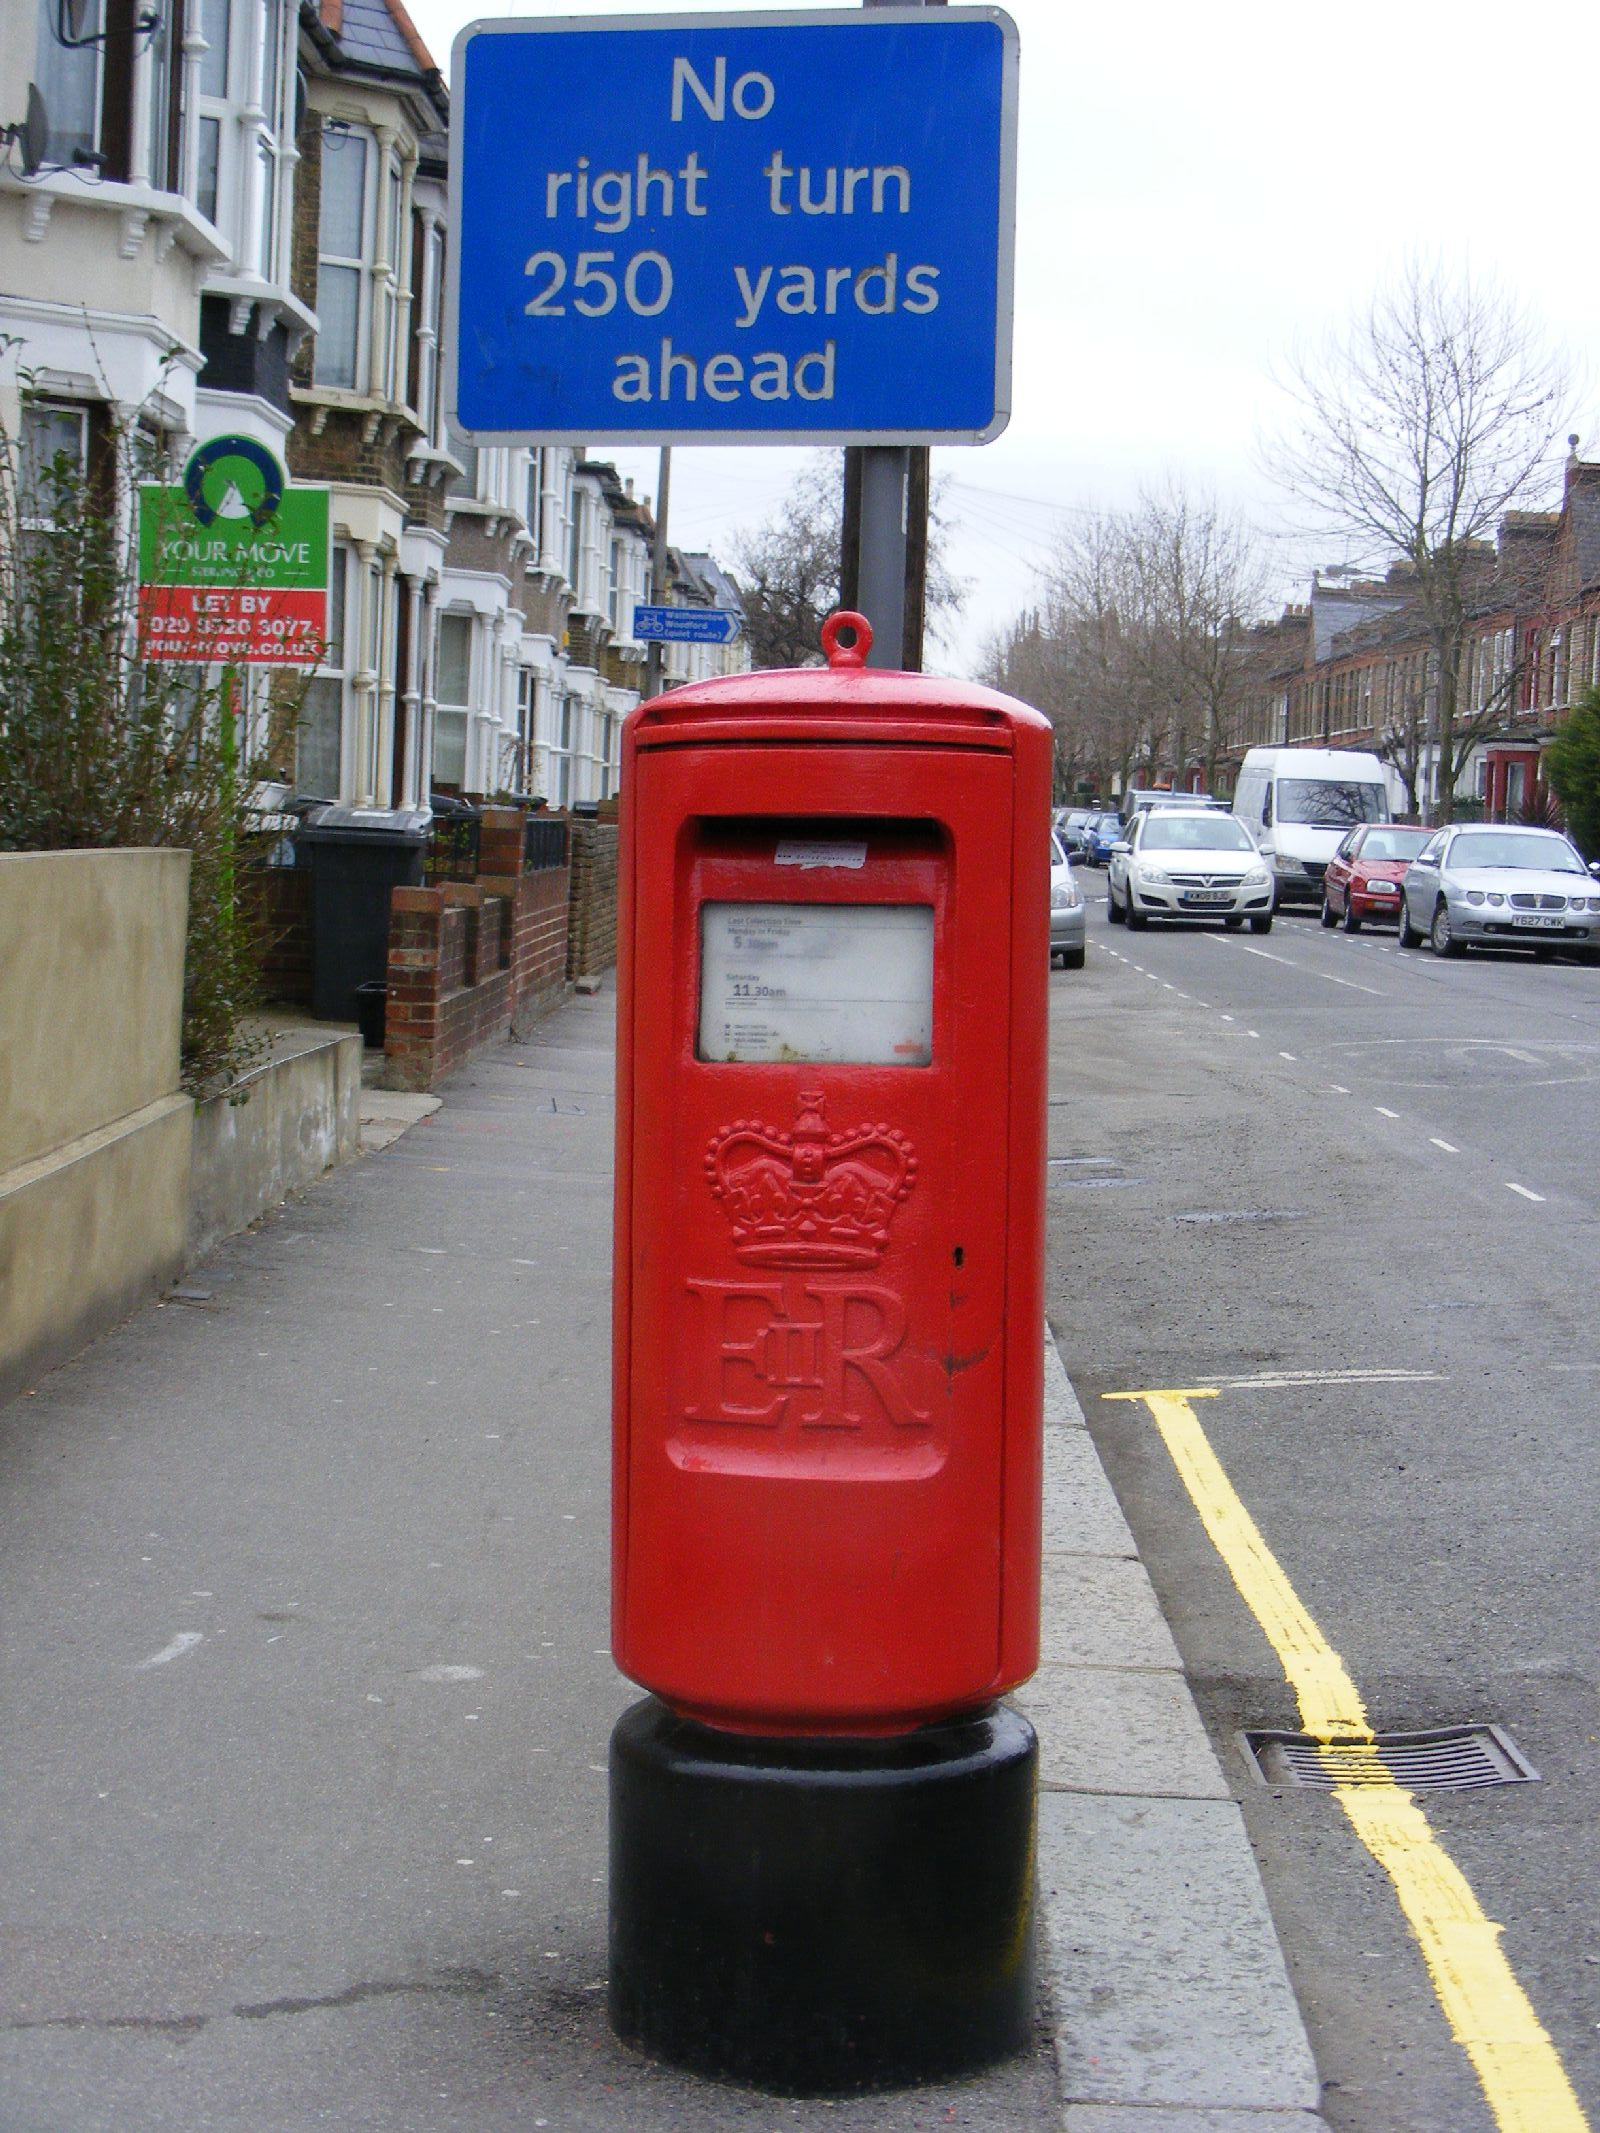 File:E17 Type K Post office letter box - Flickr - sludgegulper.jpg ...